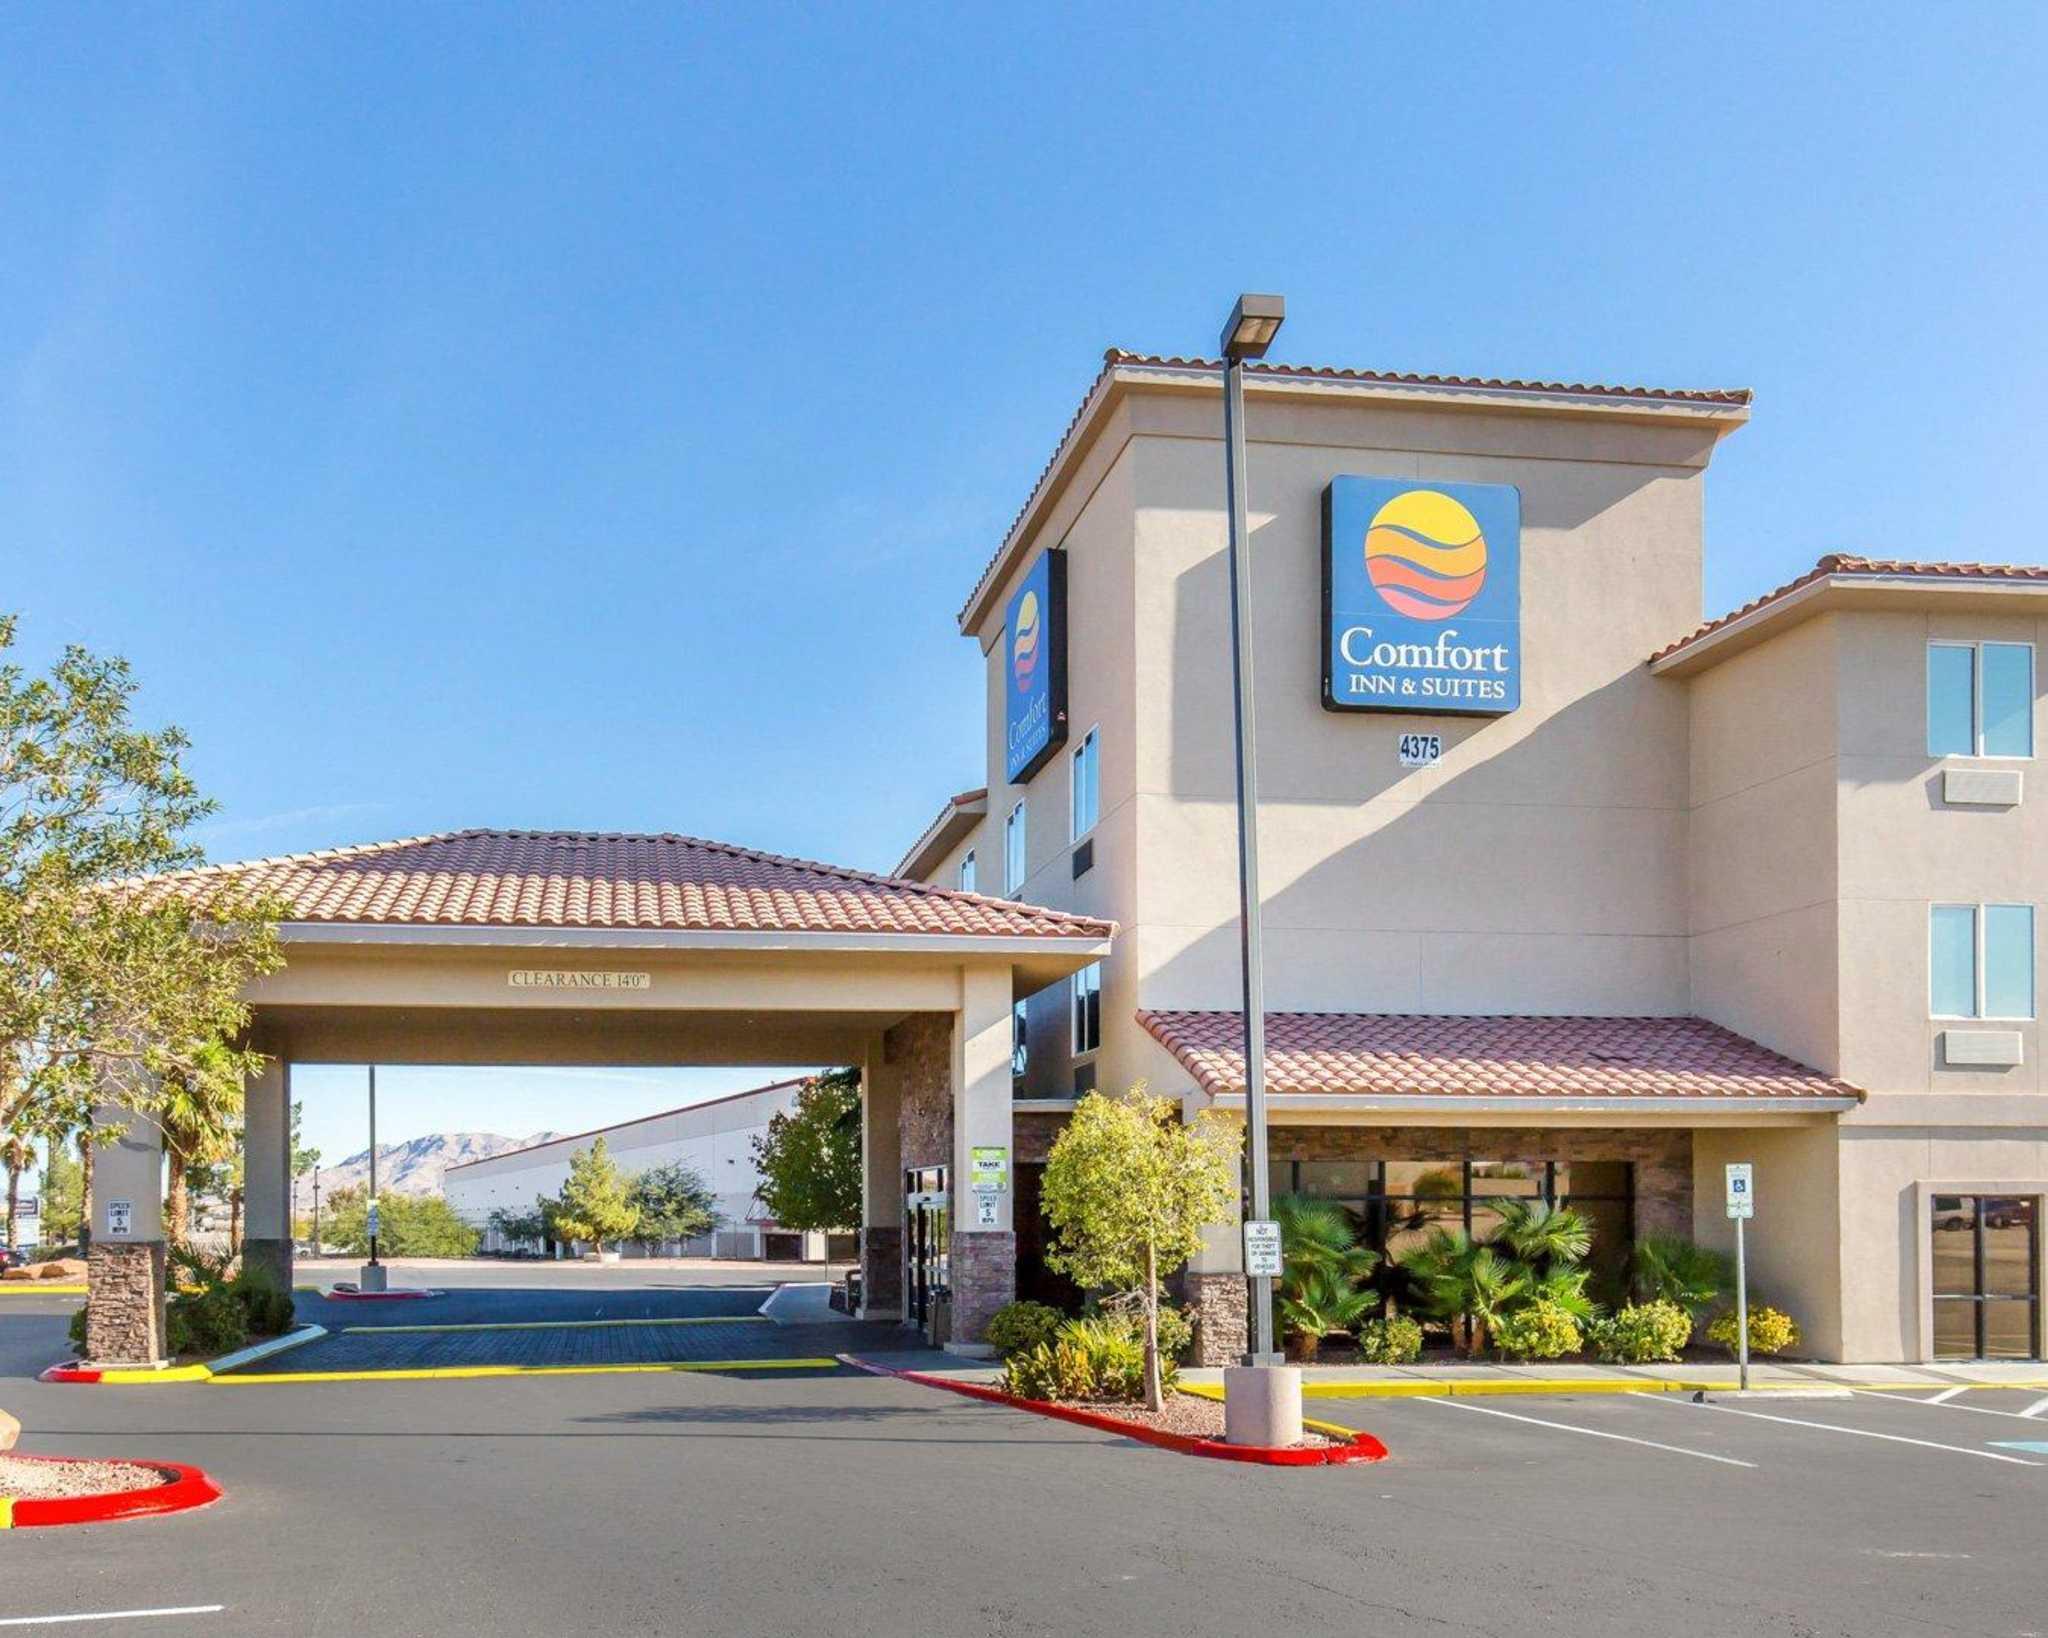 Comfort Inn & Suites Las Vegas - Nellis image 0